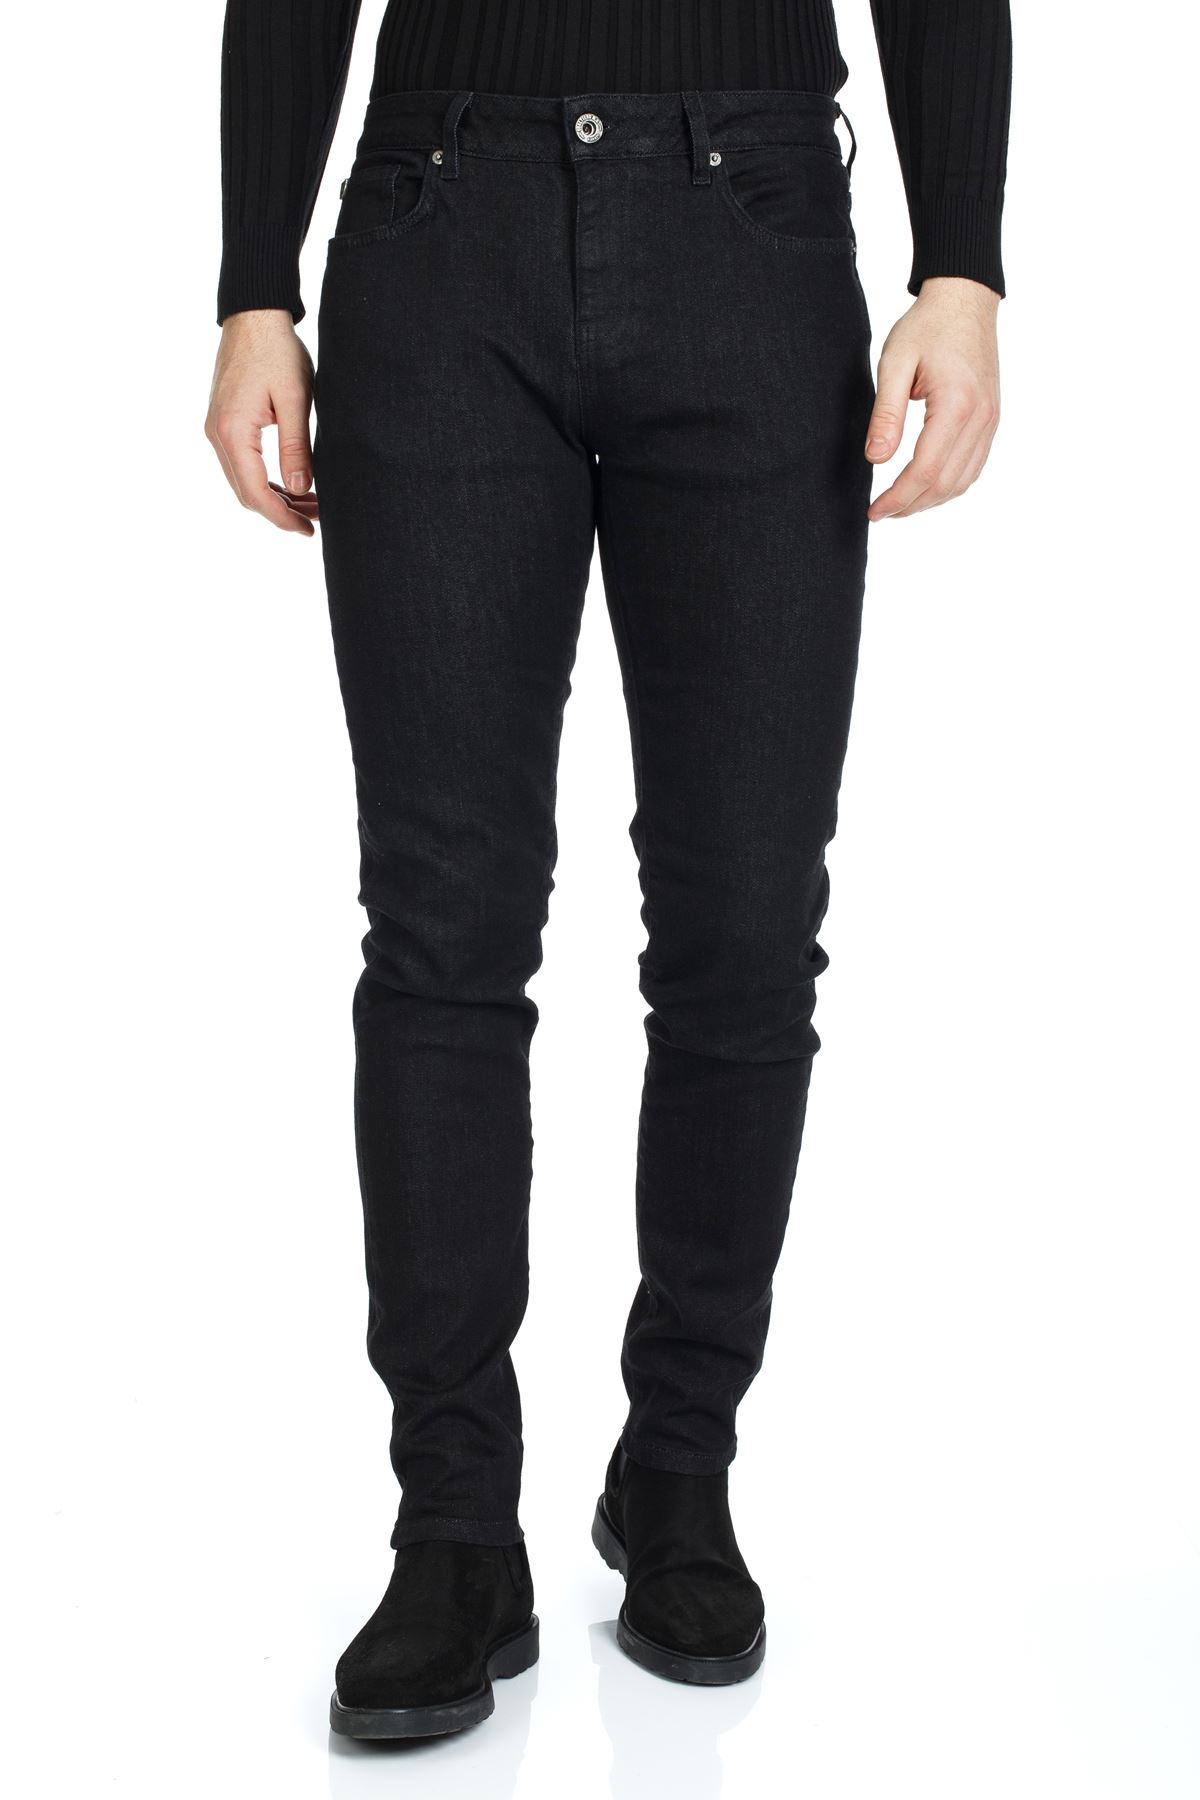 Siyah Renk Slim Kalıp Denim Kot Pantolon